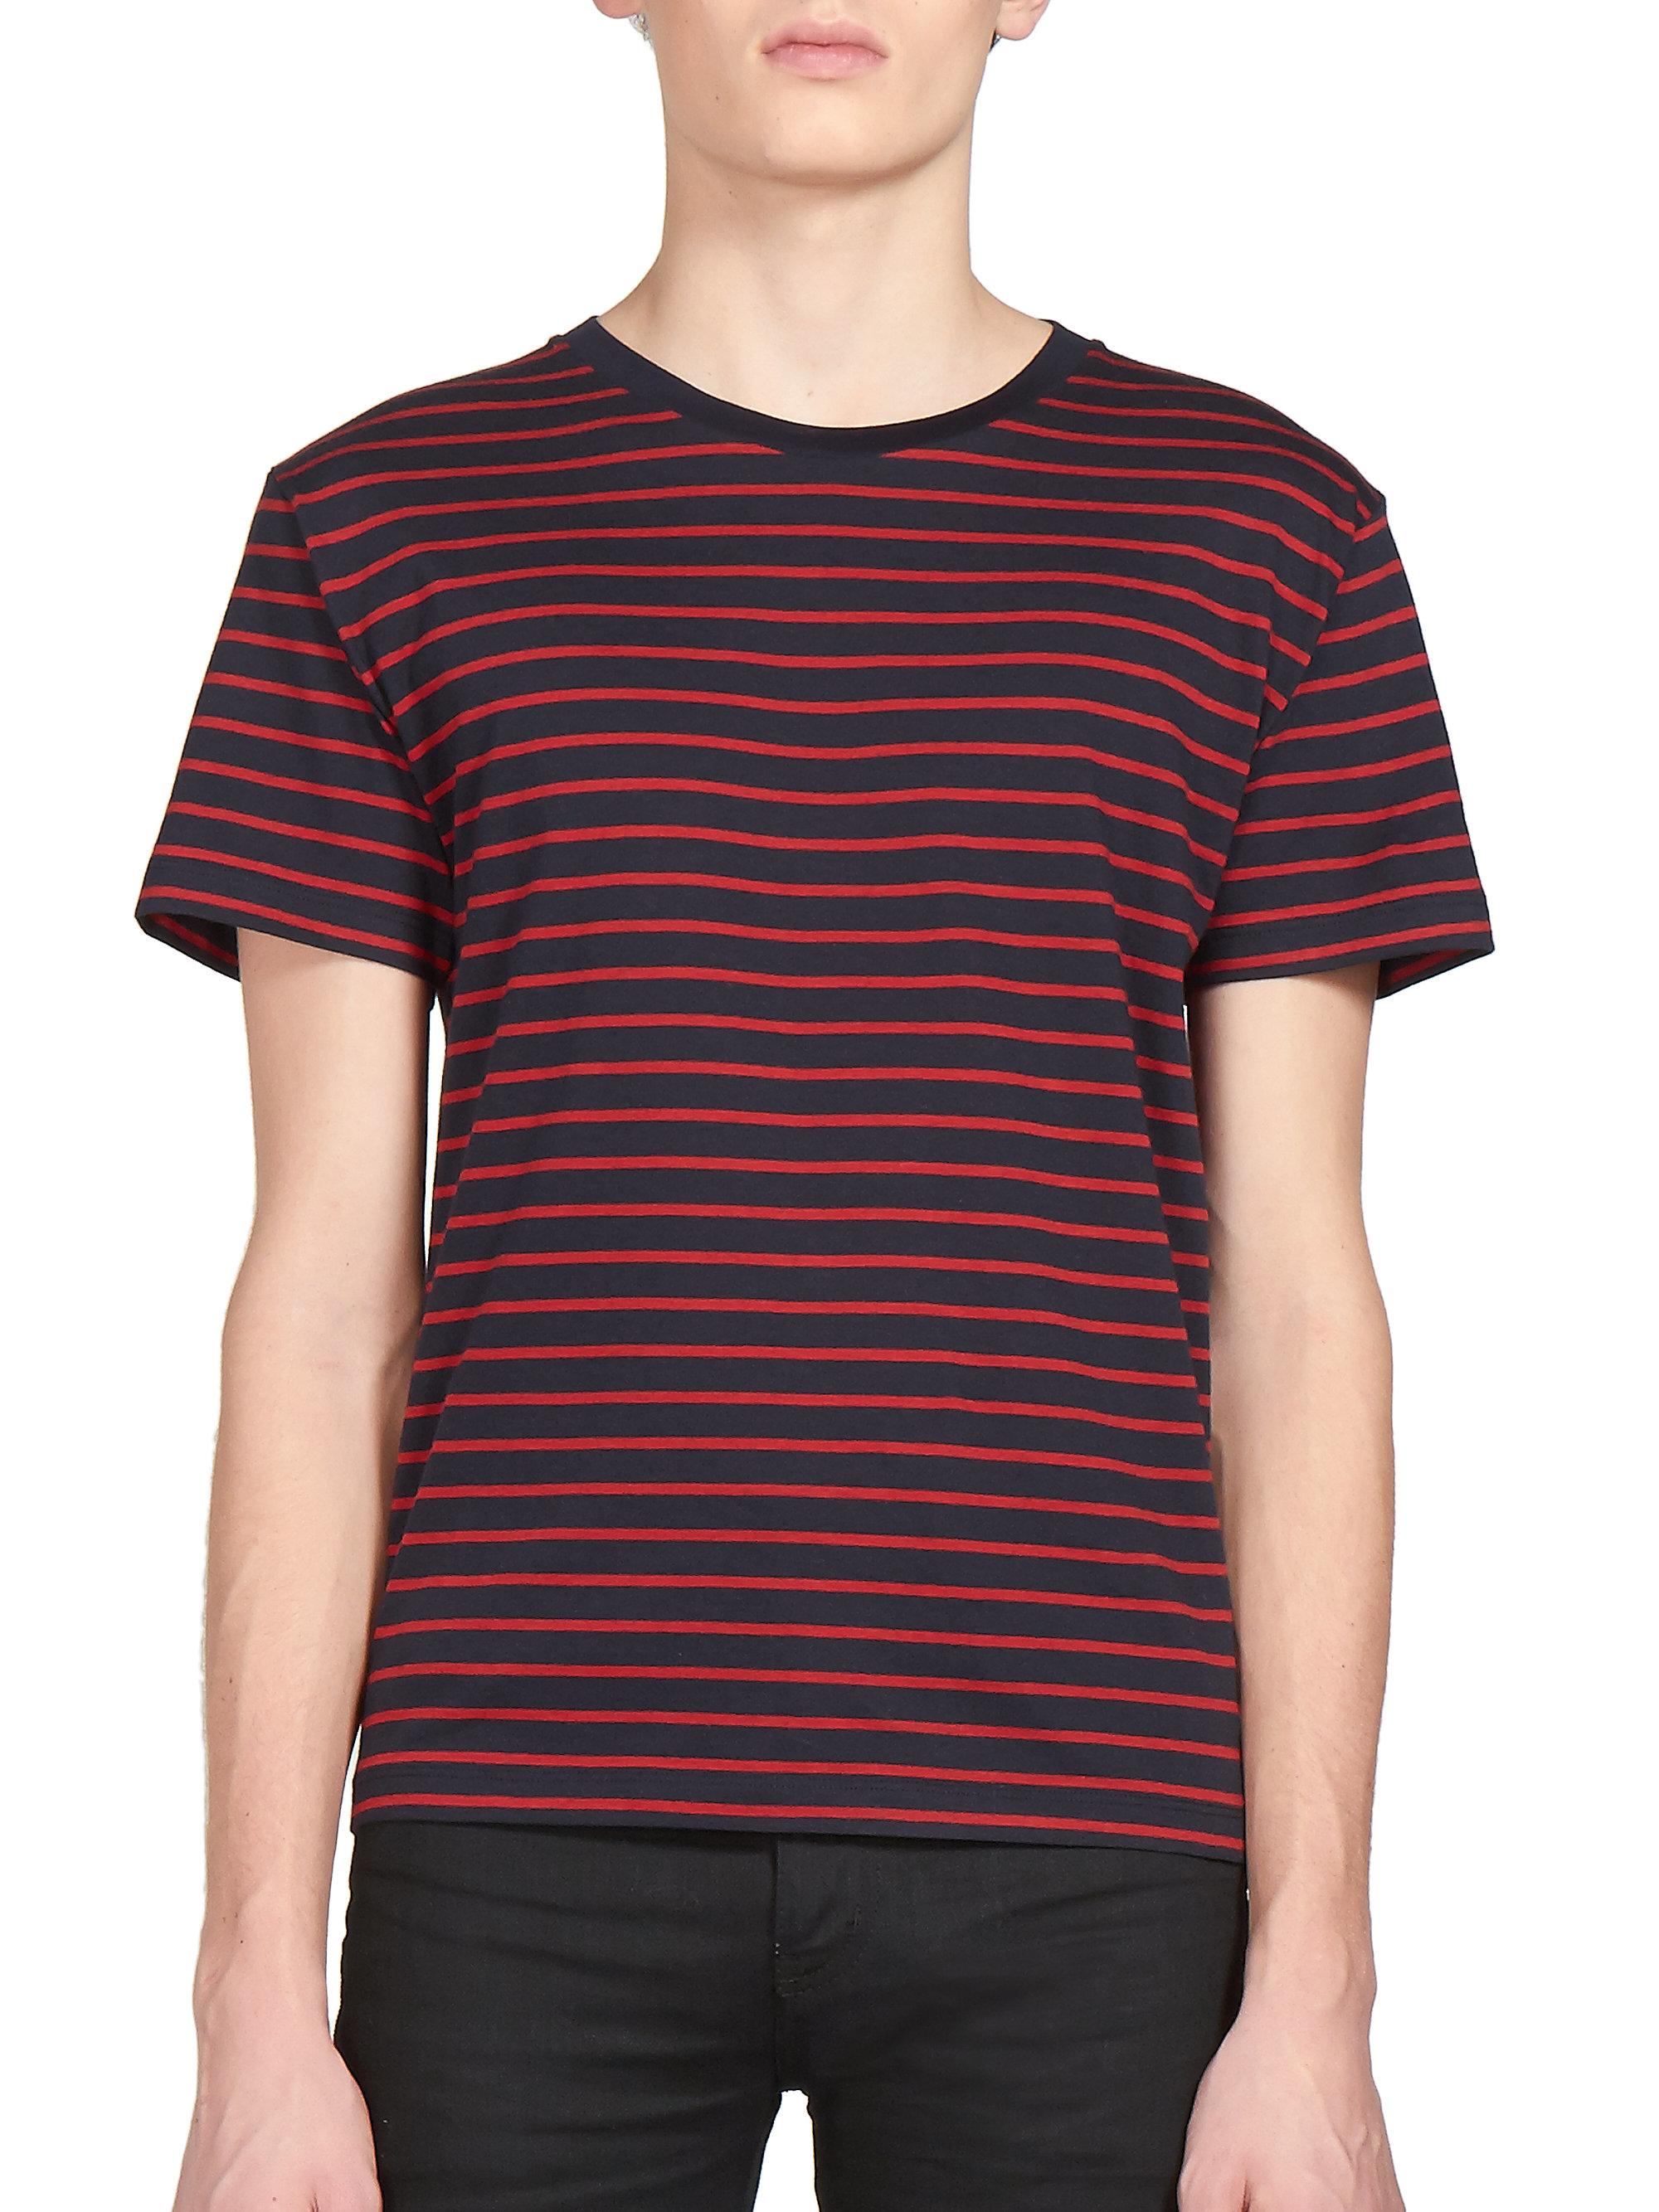 Cheap Sale 2018 Newest Black striped shirt Saint Laurent Footaction Cheap Price Genuine OLxGR